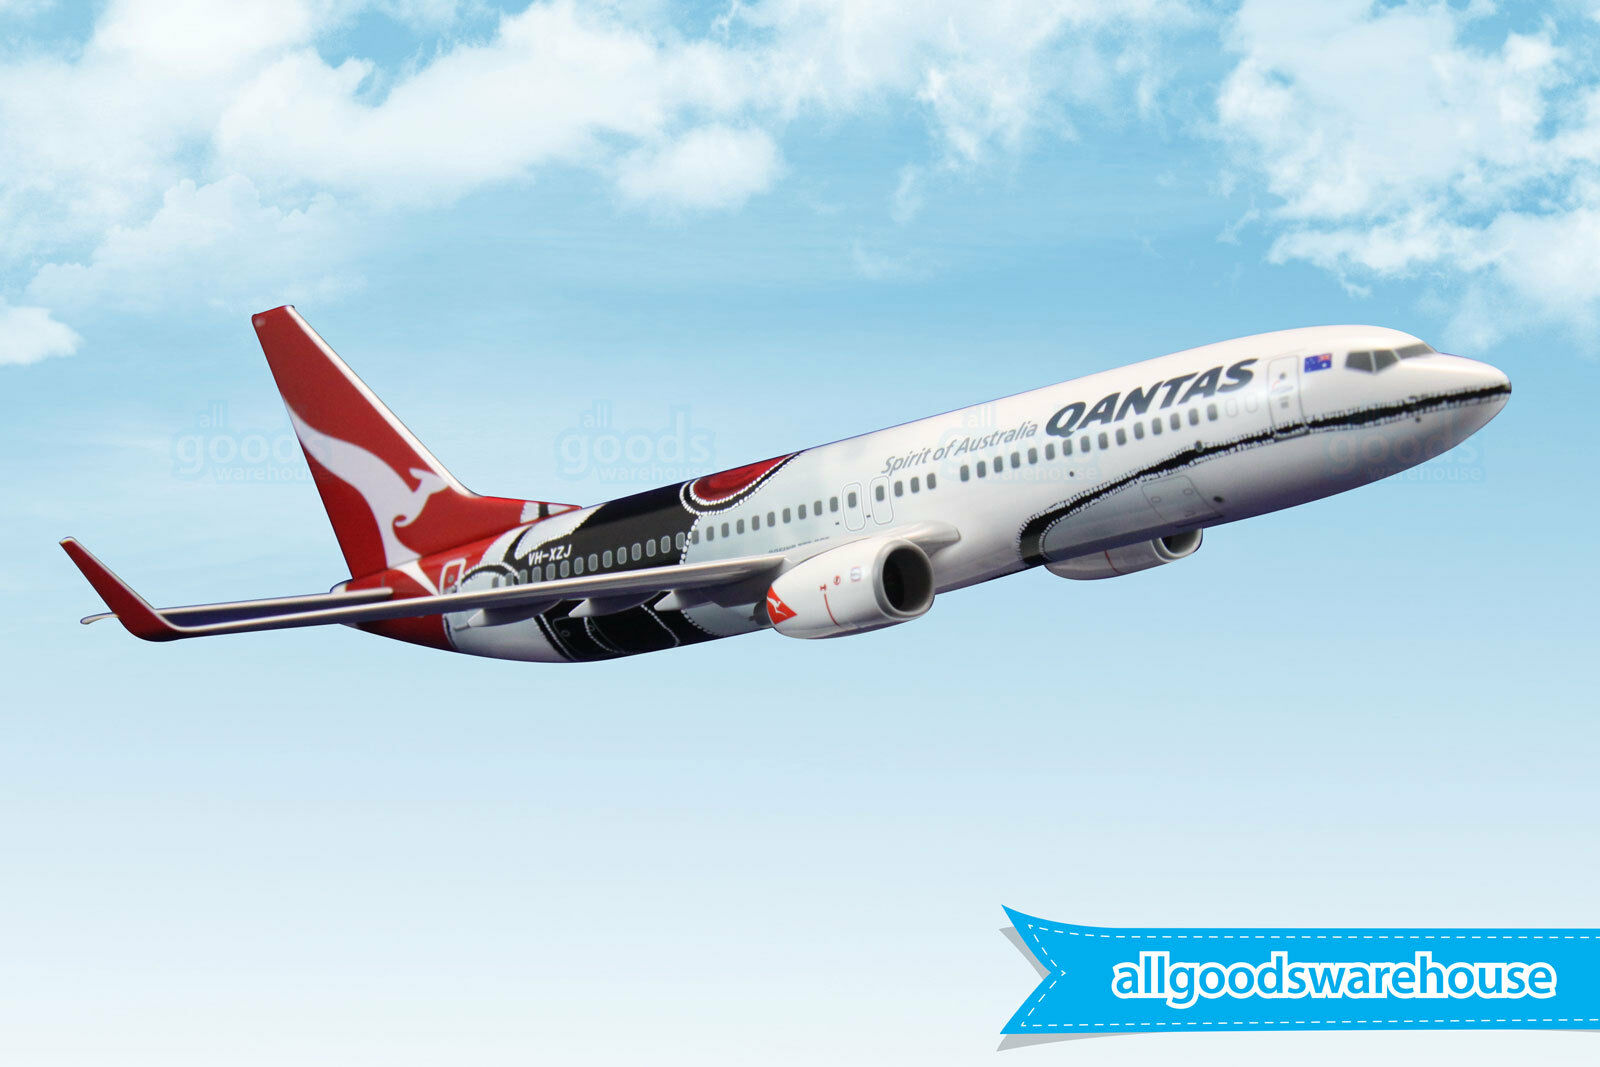 Qantas 737-800 mendoowoorrj VH-xzj 1 130 Escala Modelo de Avión 737 de plástico sólido